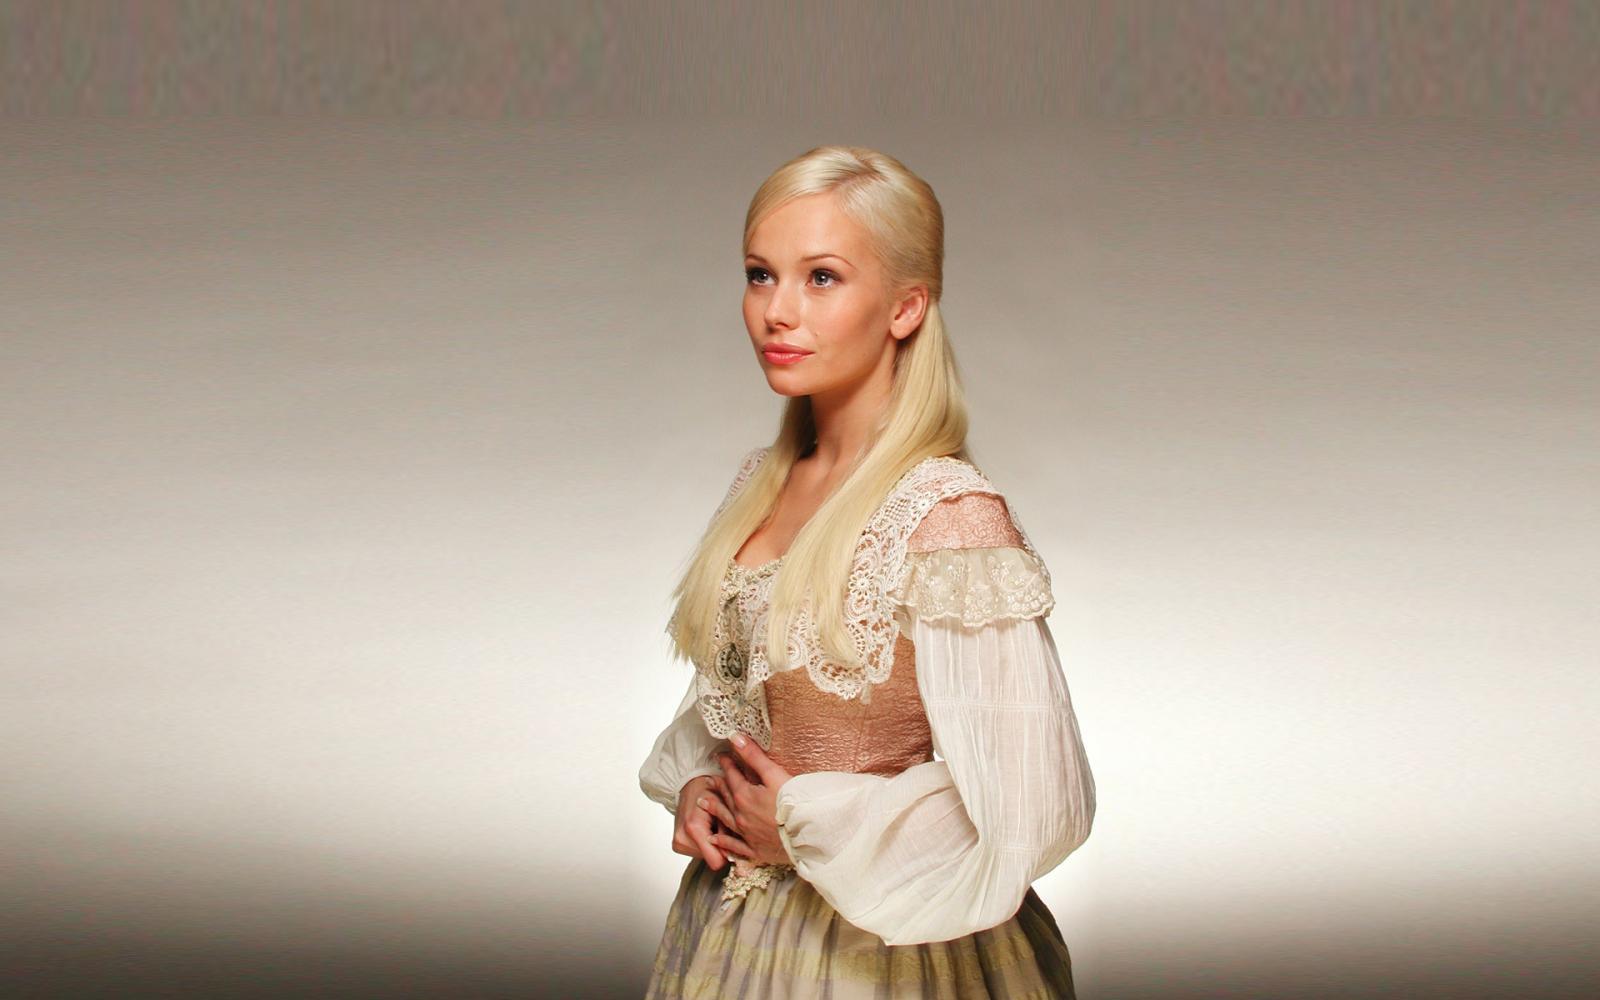 Возле московской IKEA  обокрали актрису Елену Корикову